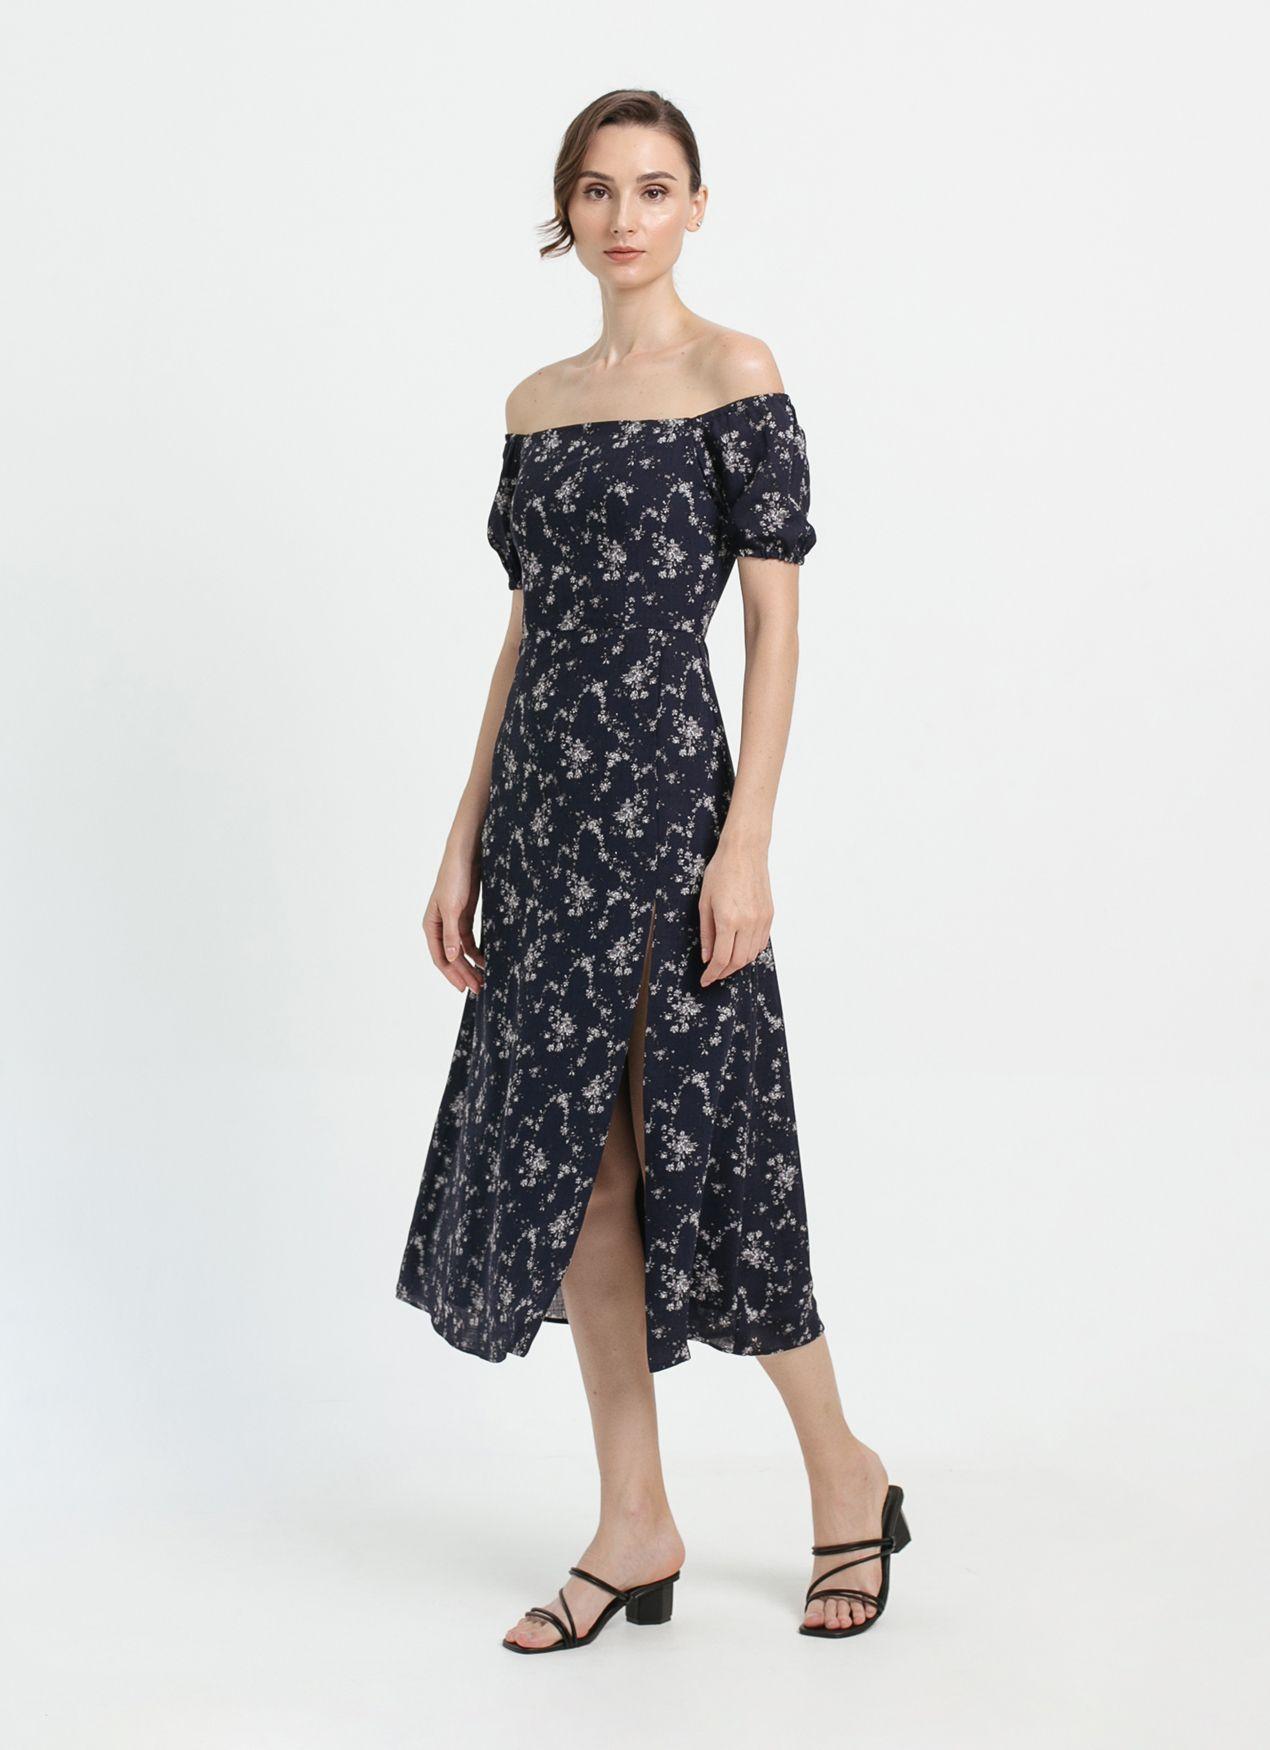 #PopbelaOOTD: Kumpulan Floral Dress untuk Musim Panas 2020